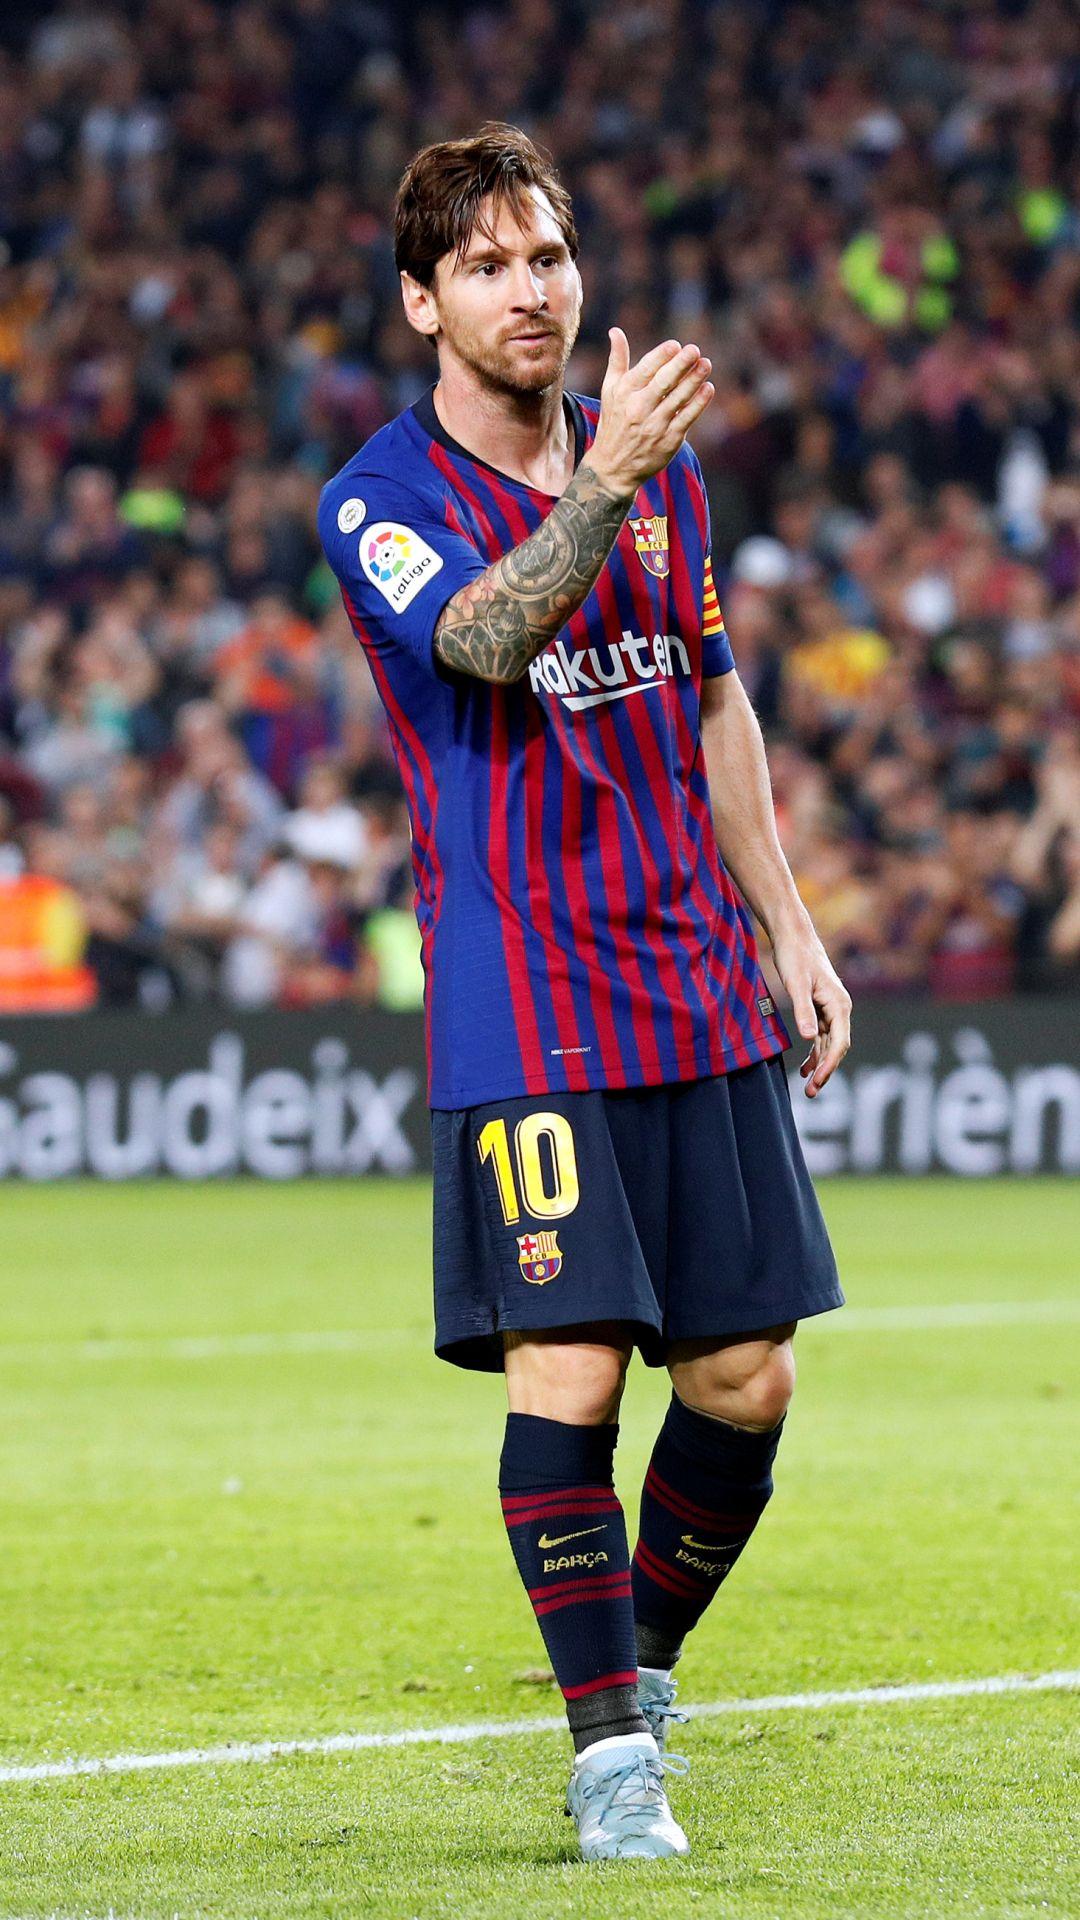 Lionel Messi In 2021 Lionel Messi Messi Lionel Messi Wallpapers